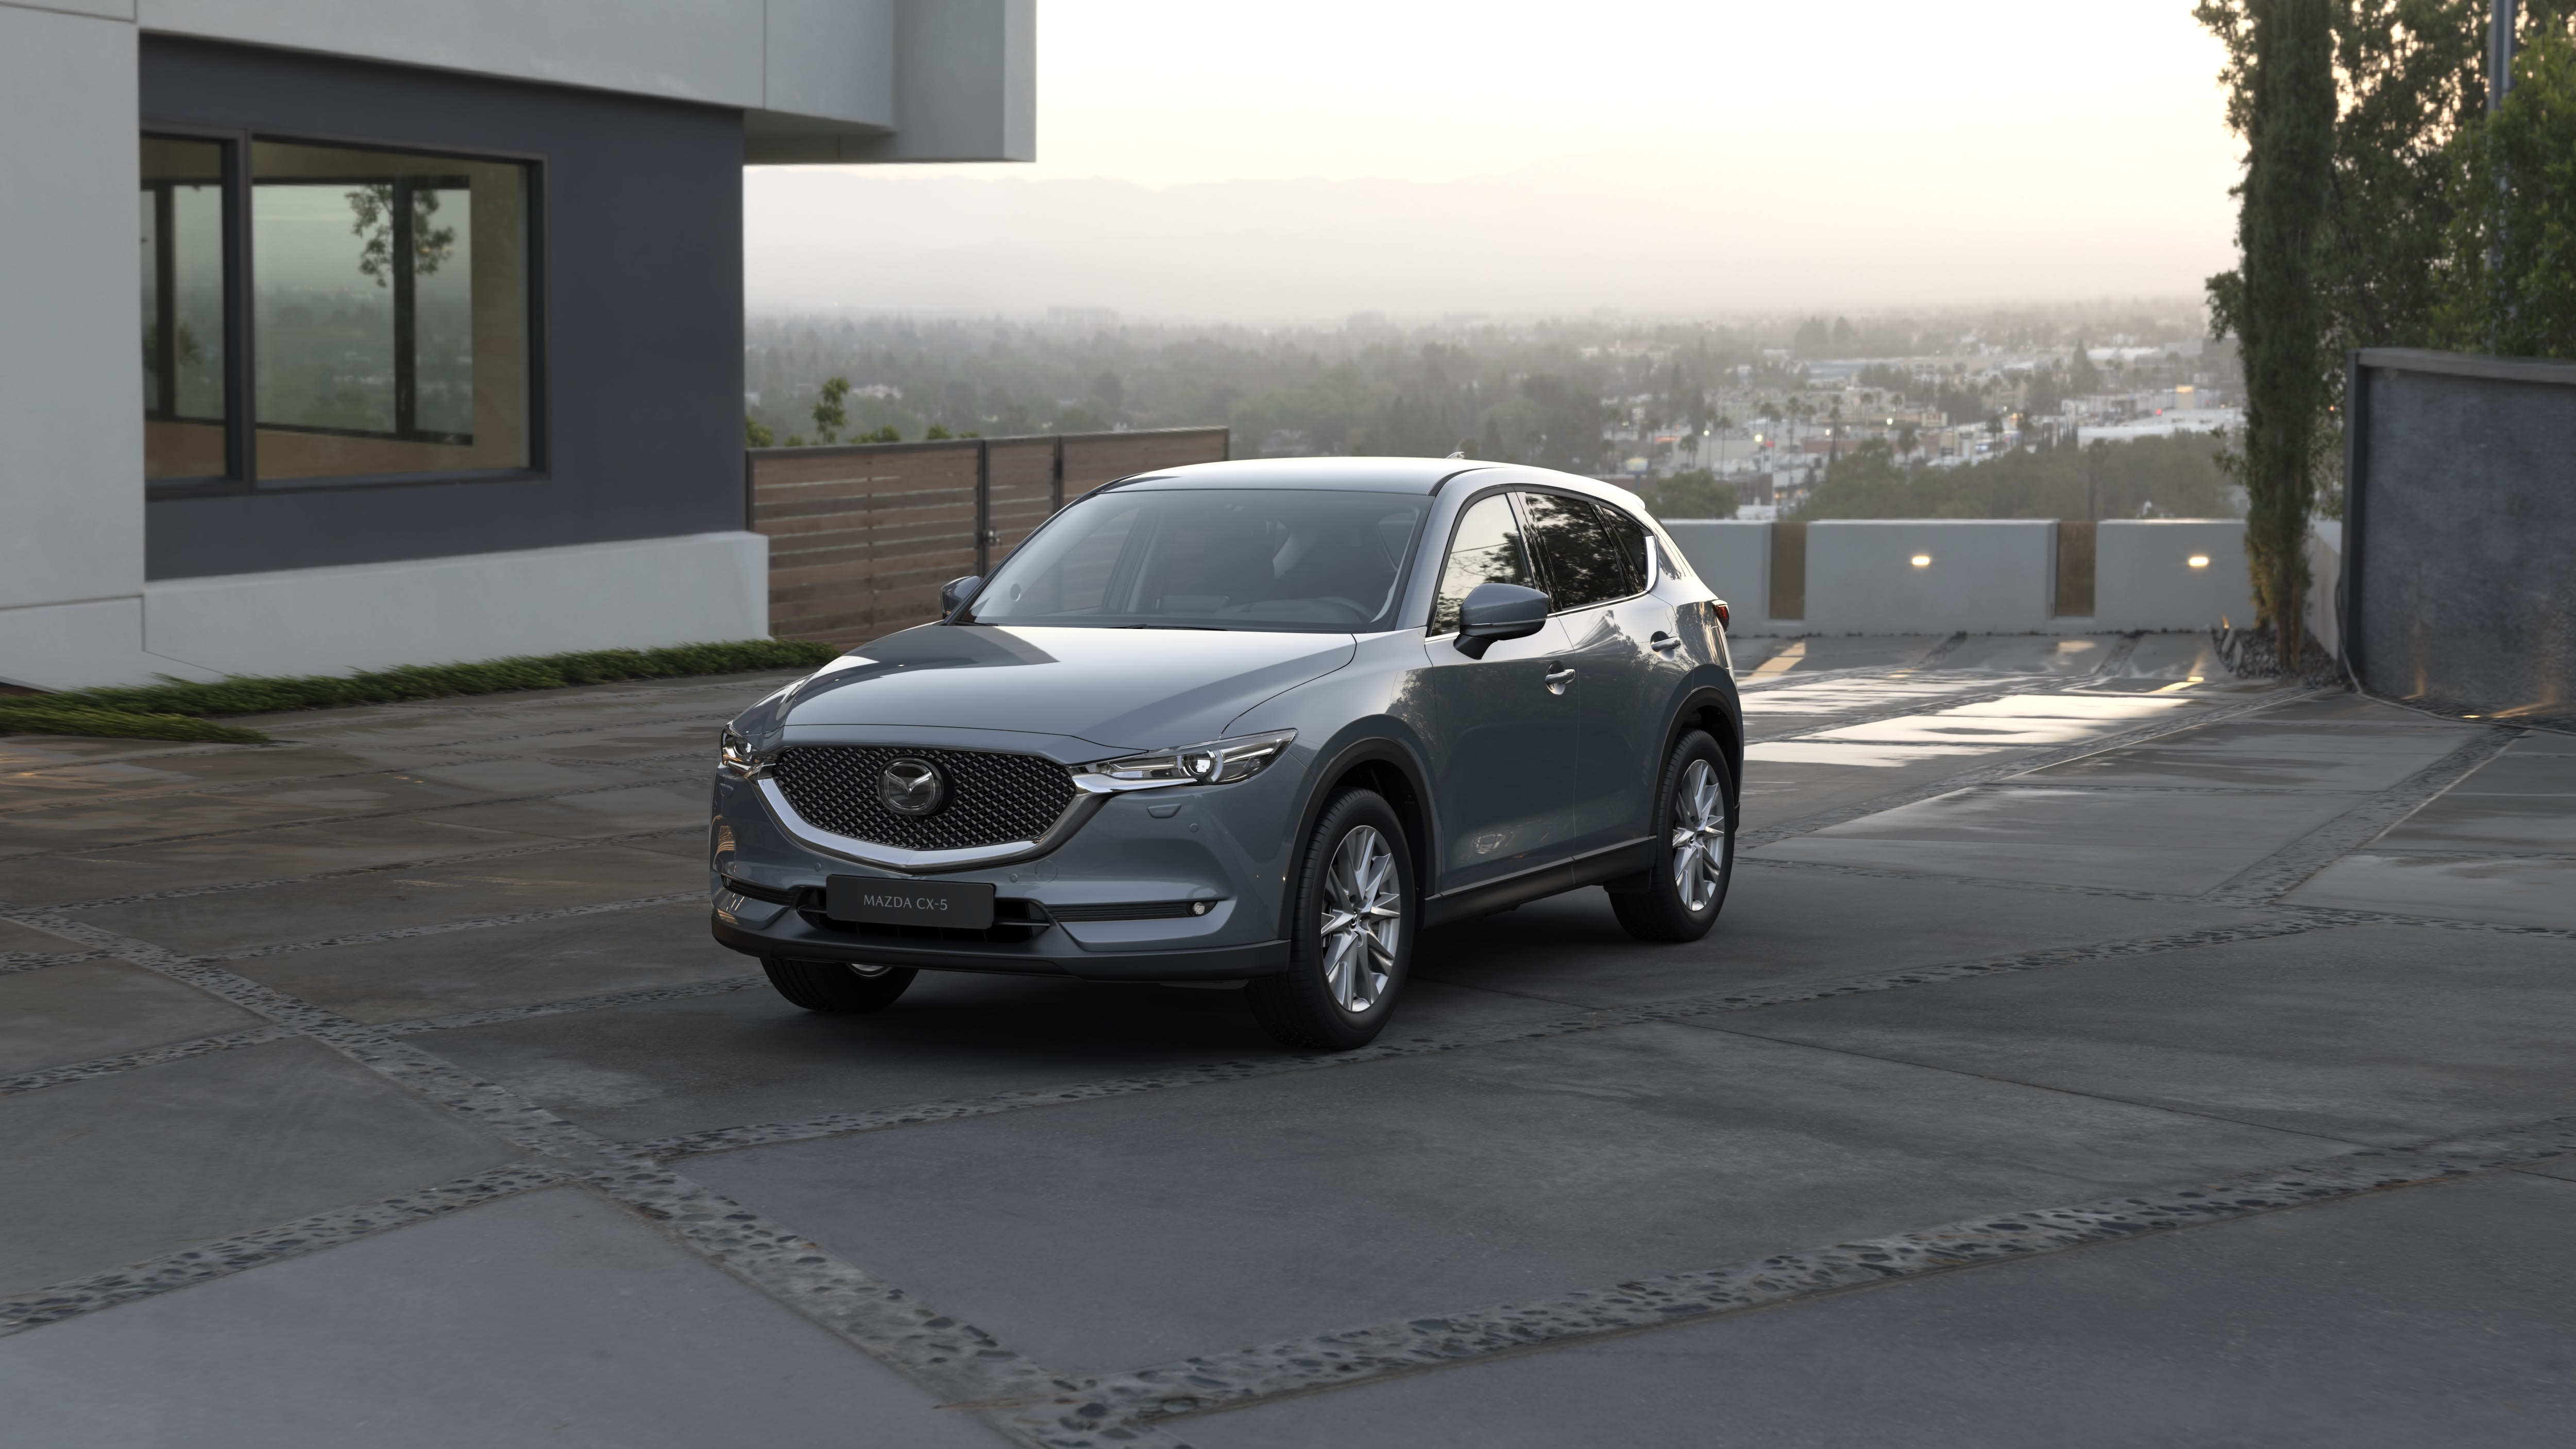 2020 Mazda Cx 5 Release Date and Concept